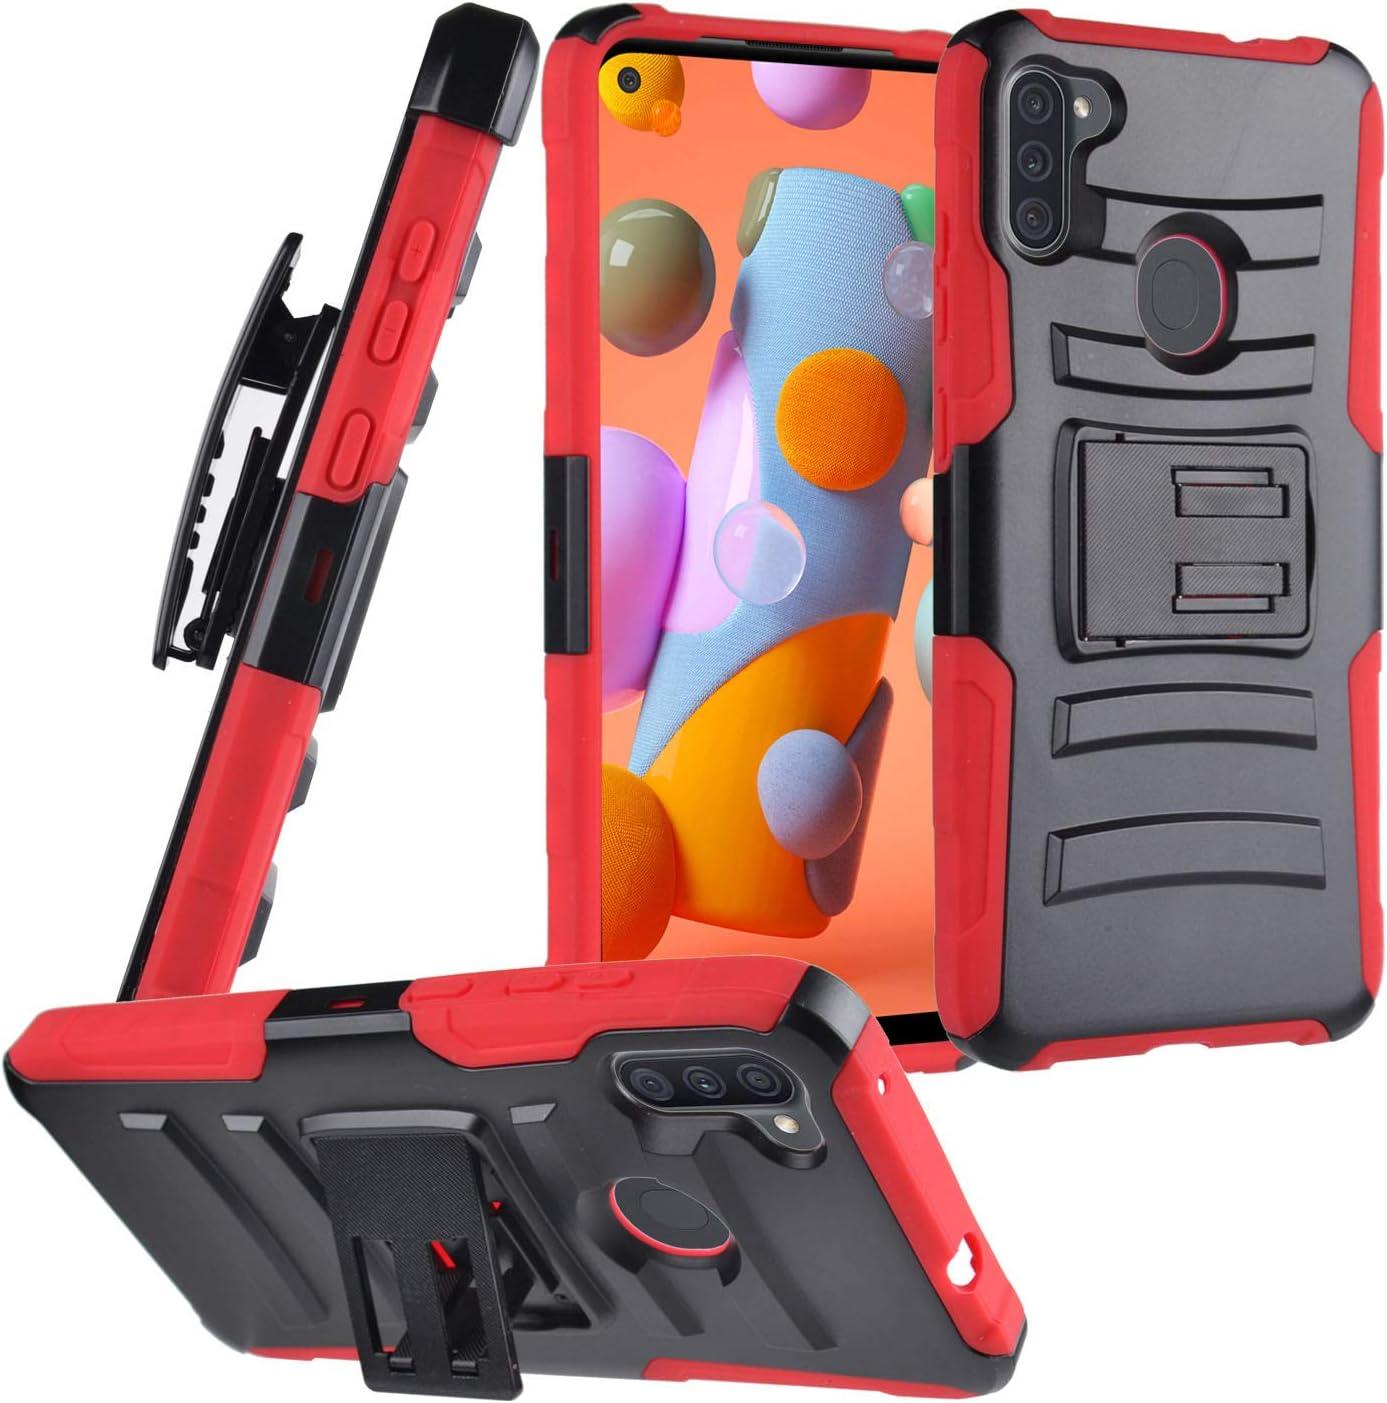 CELZEN - for Samsung Galaxy A11 (SM-A115) - Phone Case w/Belt Clip Holster - CV1 Red